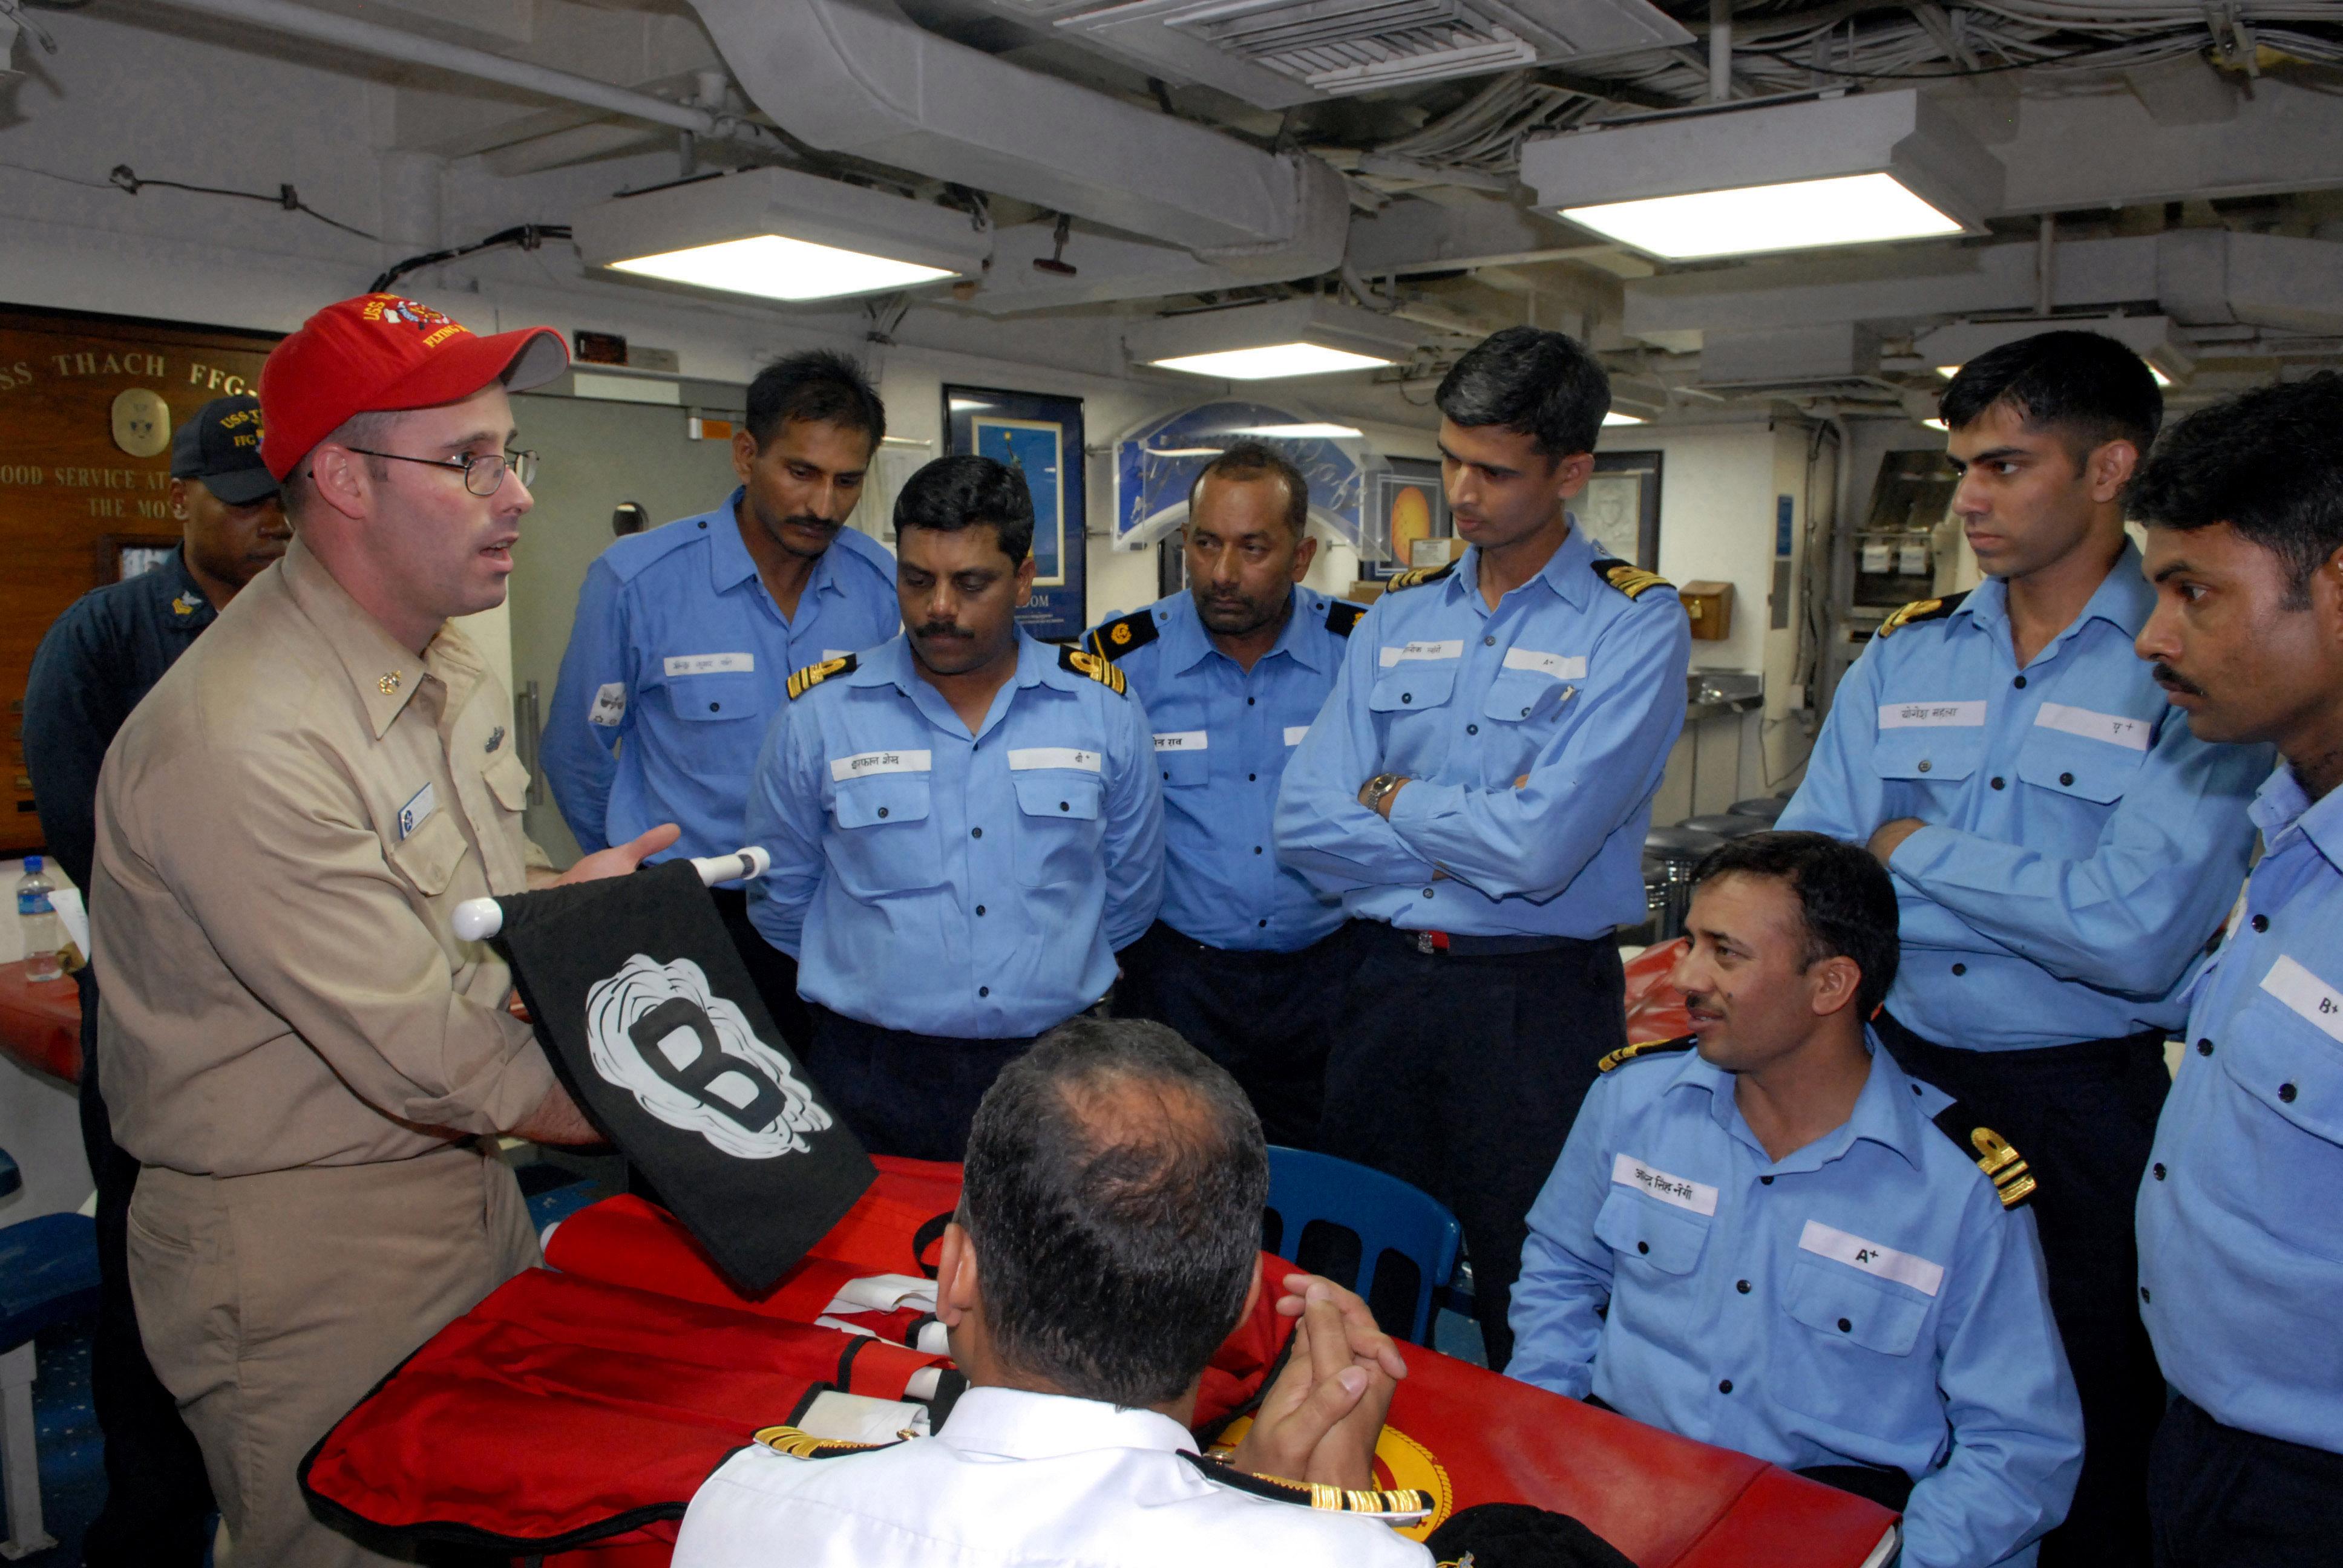 Tom kennedy us army claims service - File Us Navy 081018 N 1635s 010 Chief Damage Controlman Tom Kennedy